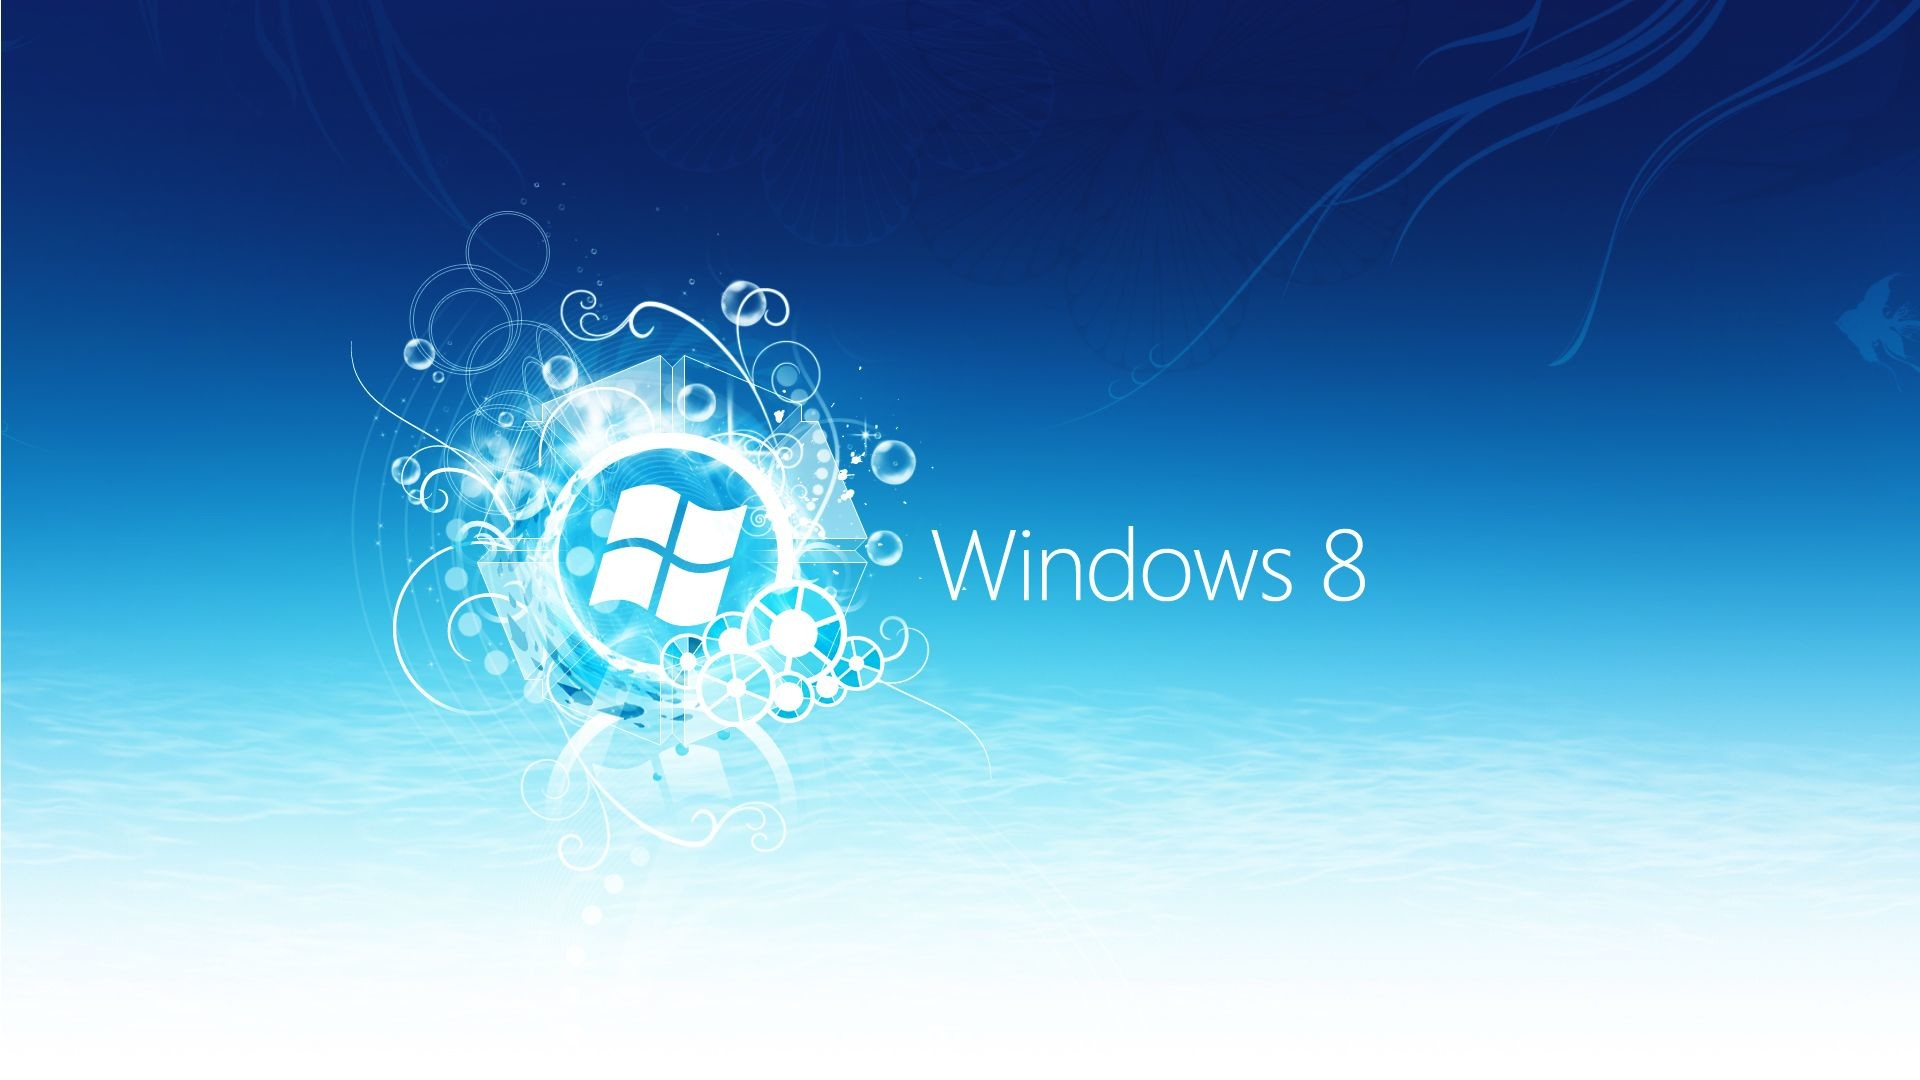 Windows 10 HD Desktop Wallpaper (74+ images)